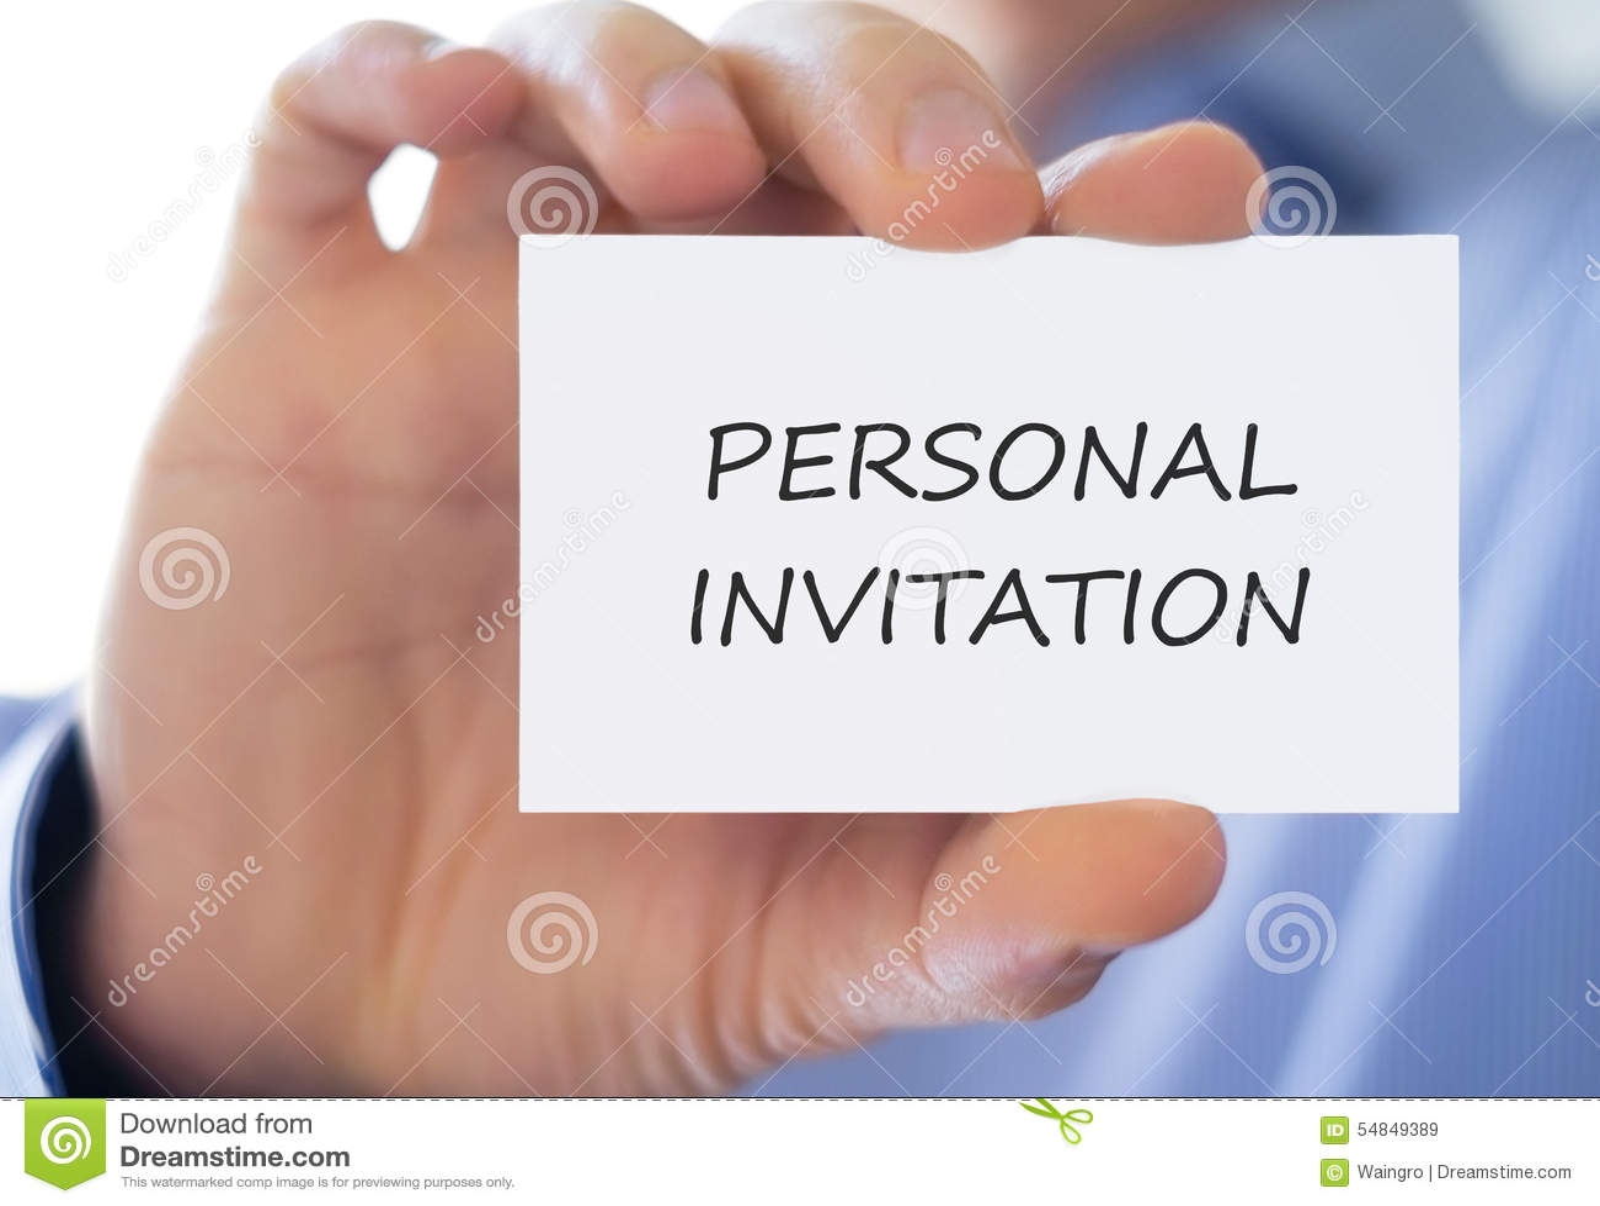 personal invitation stock image image of invite help 54849389